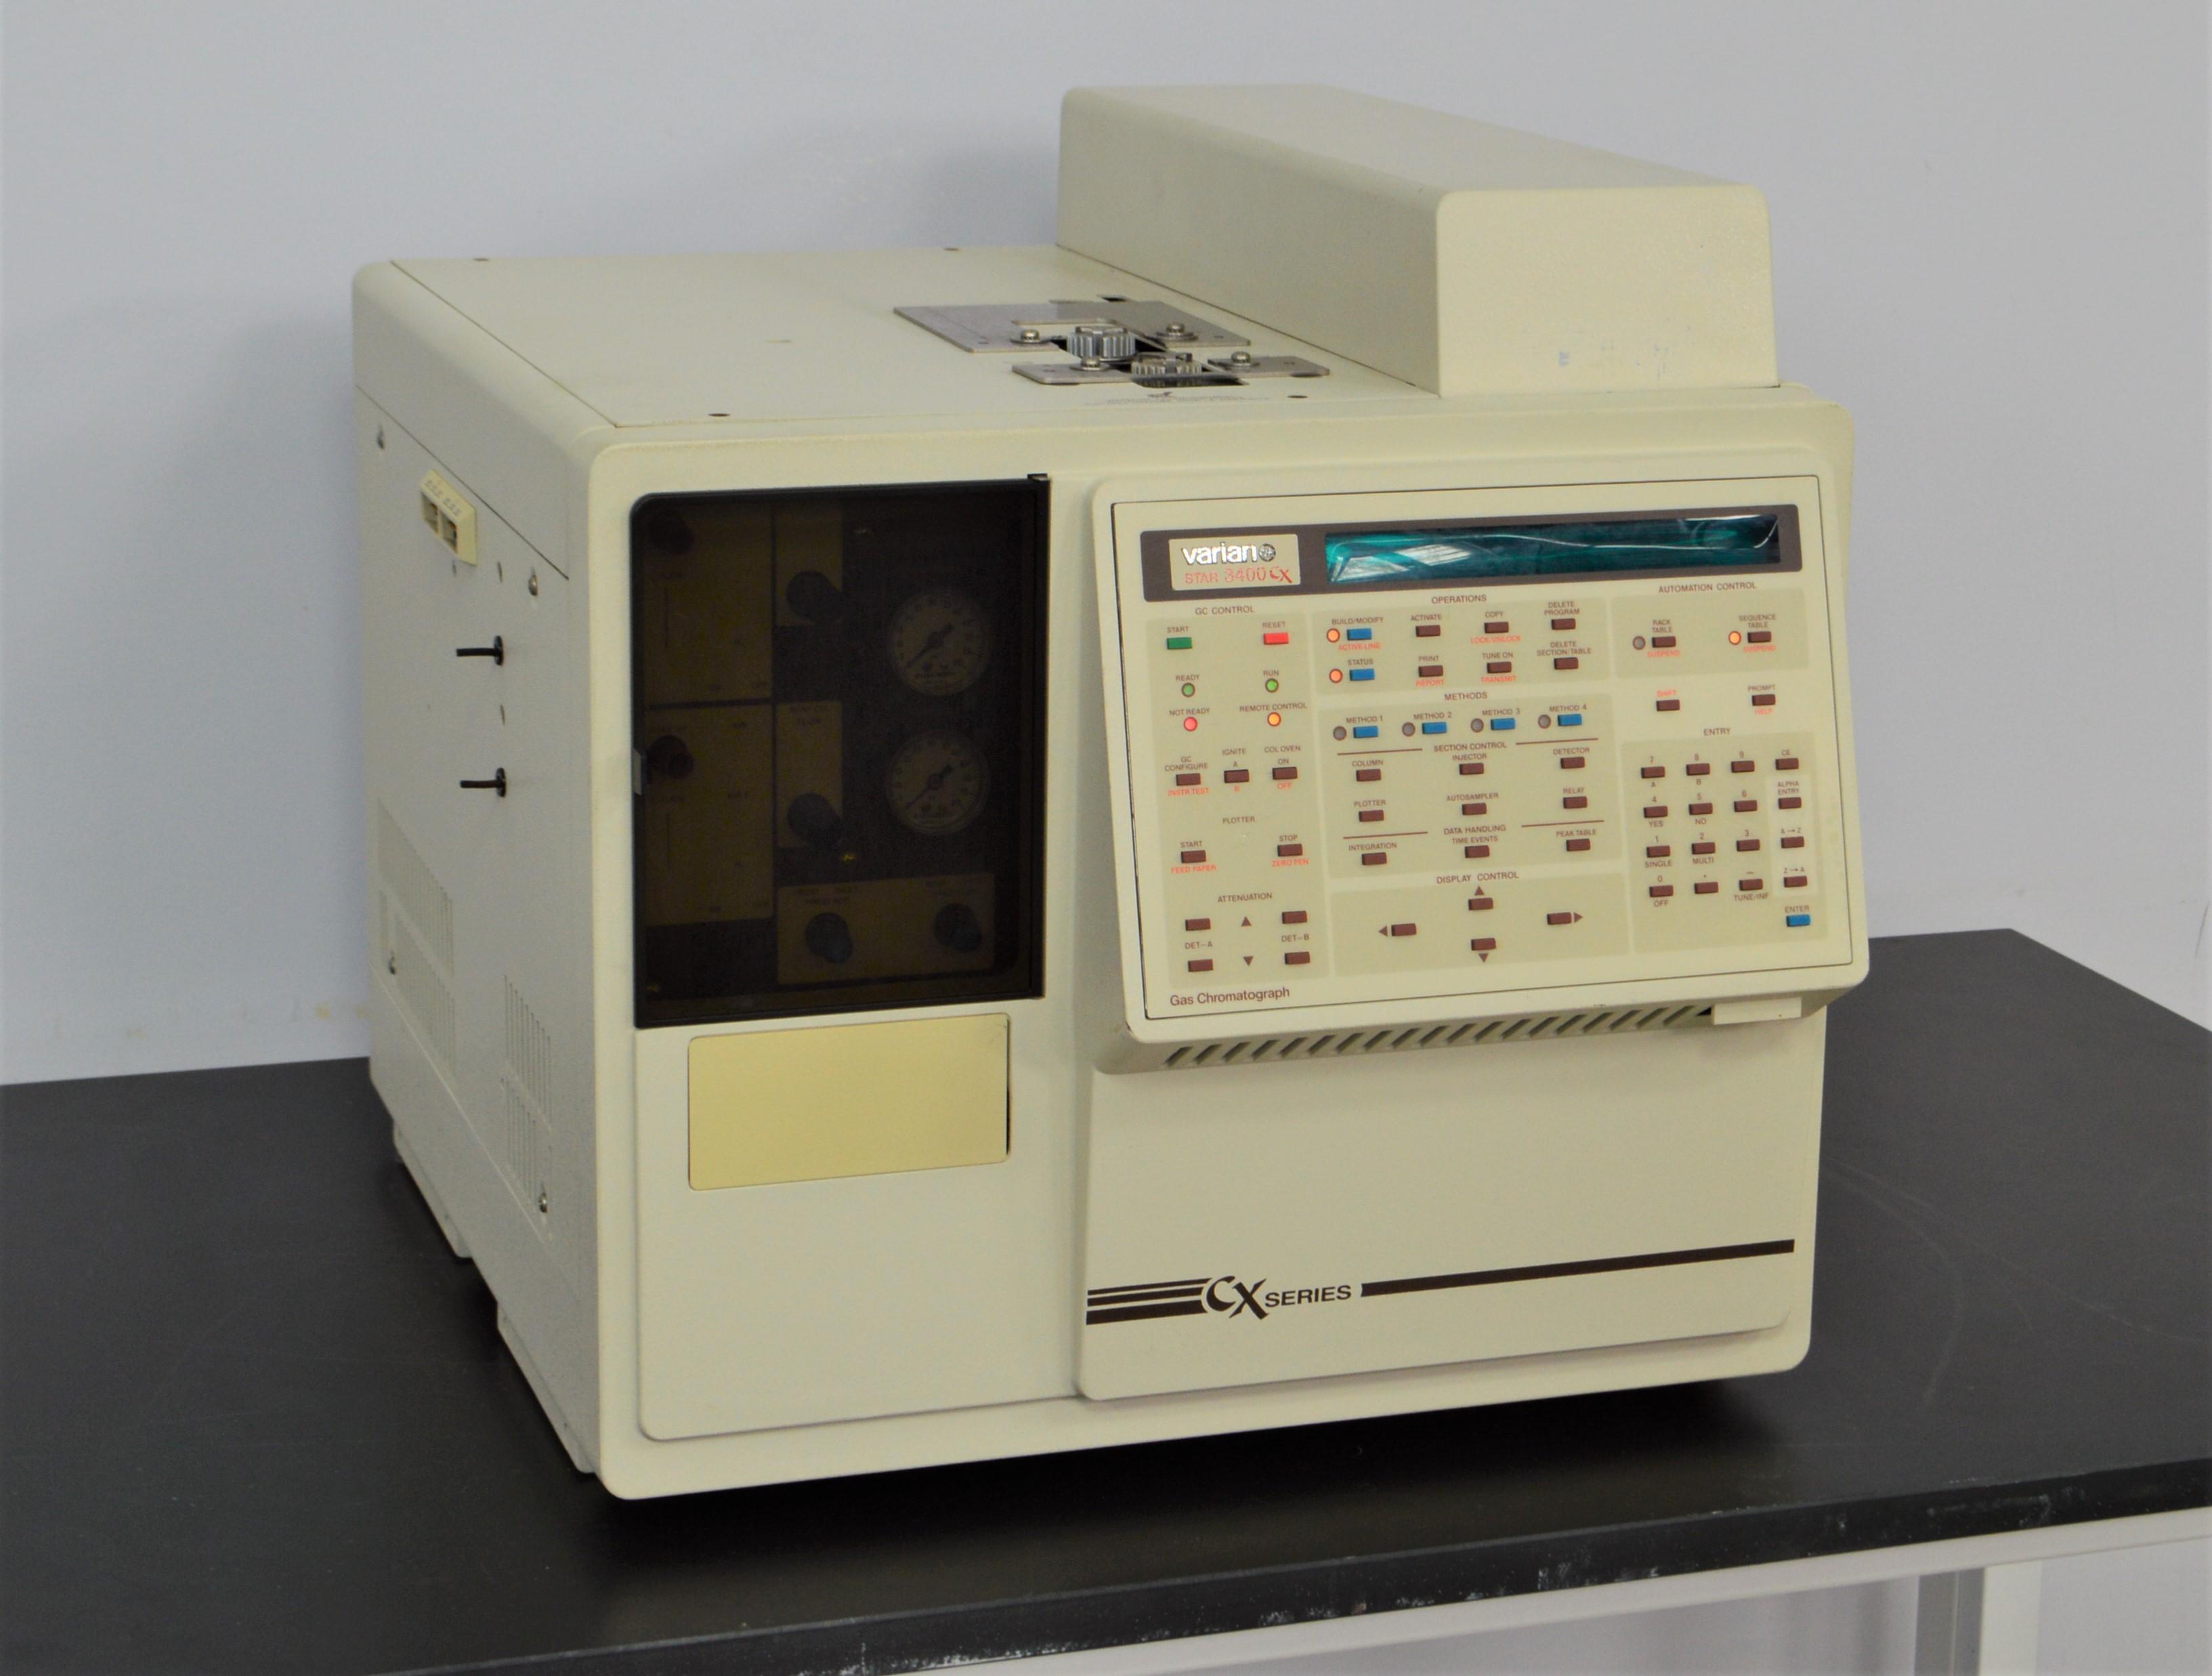 Varian Star Cx Series Gc Gas Chromatograph New Life